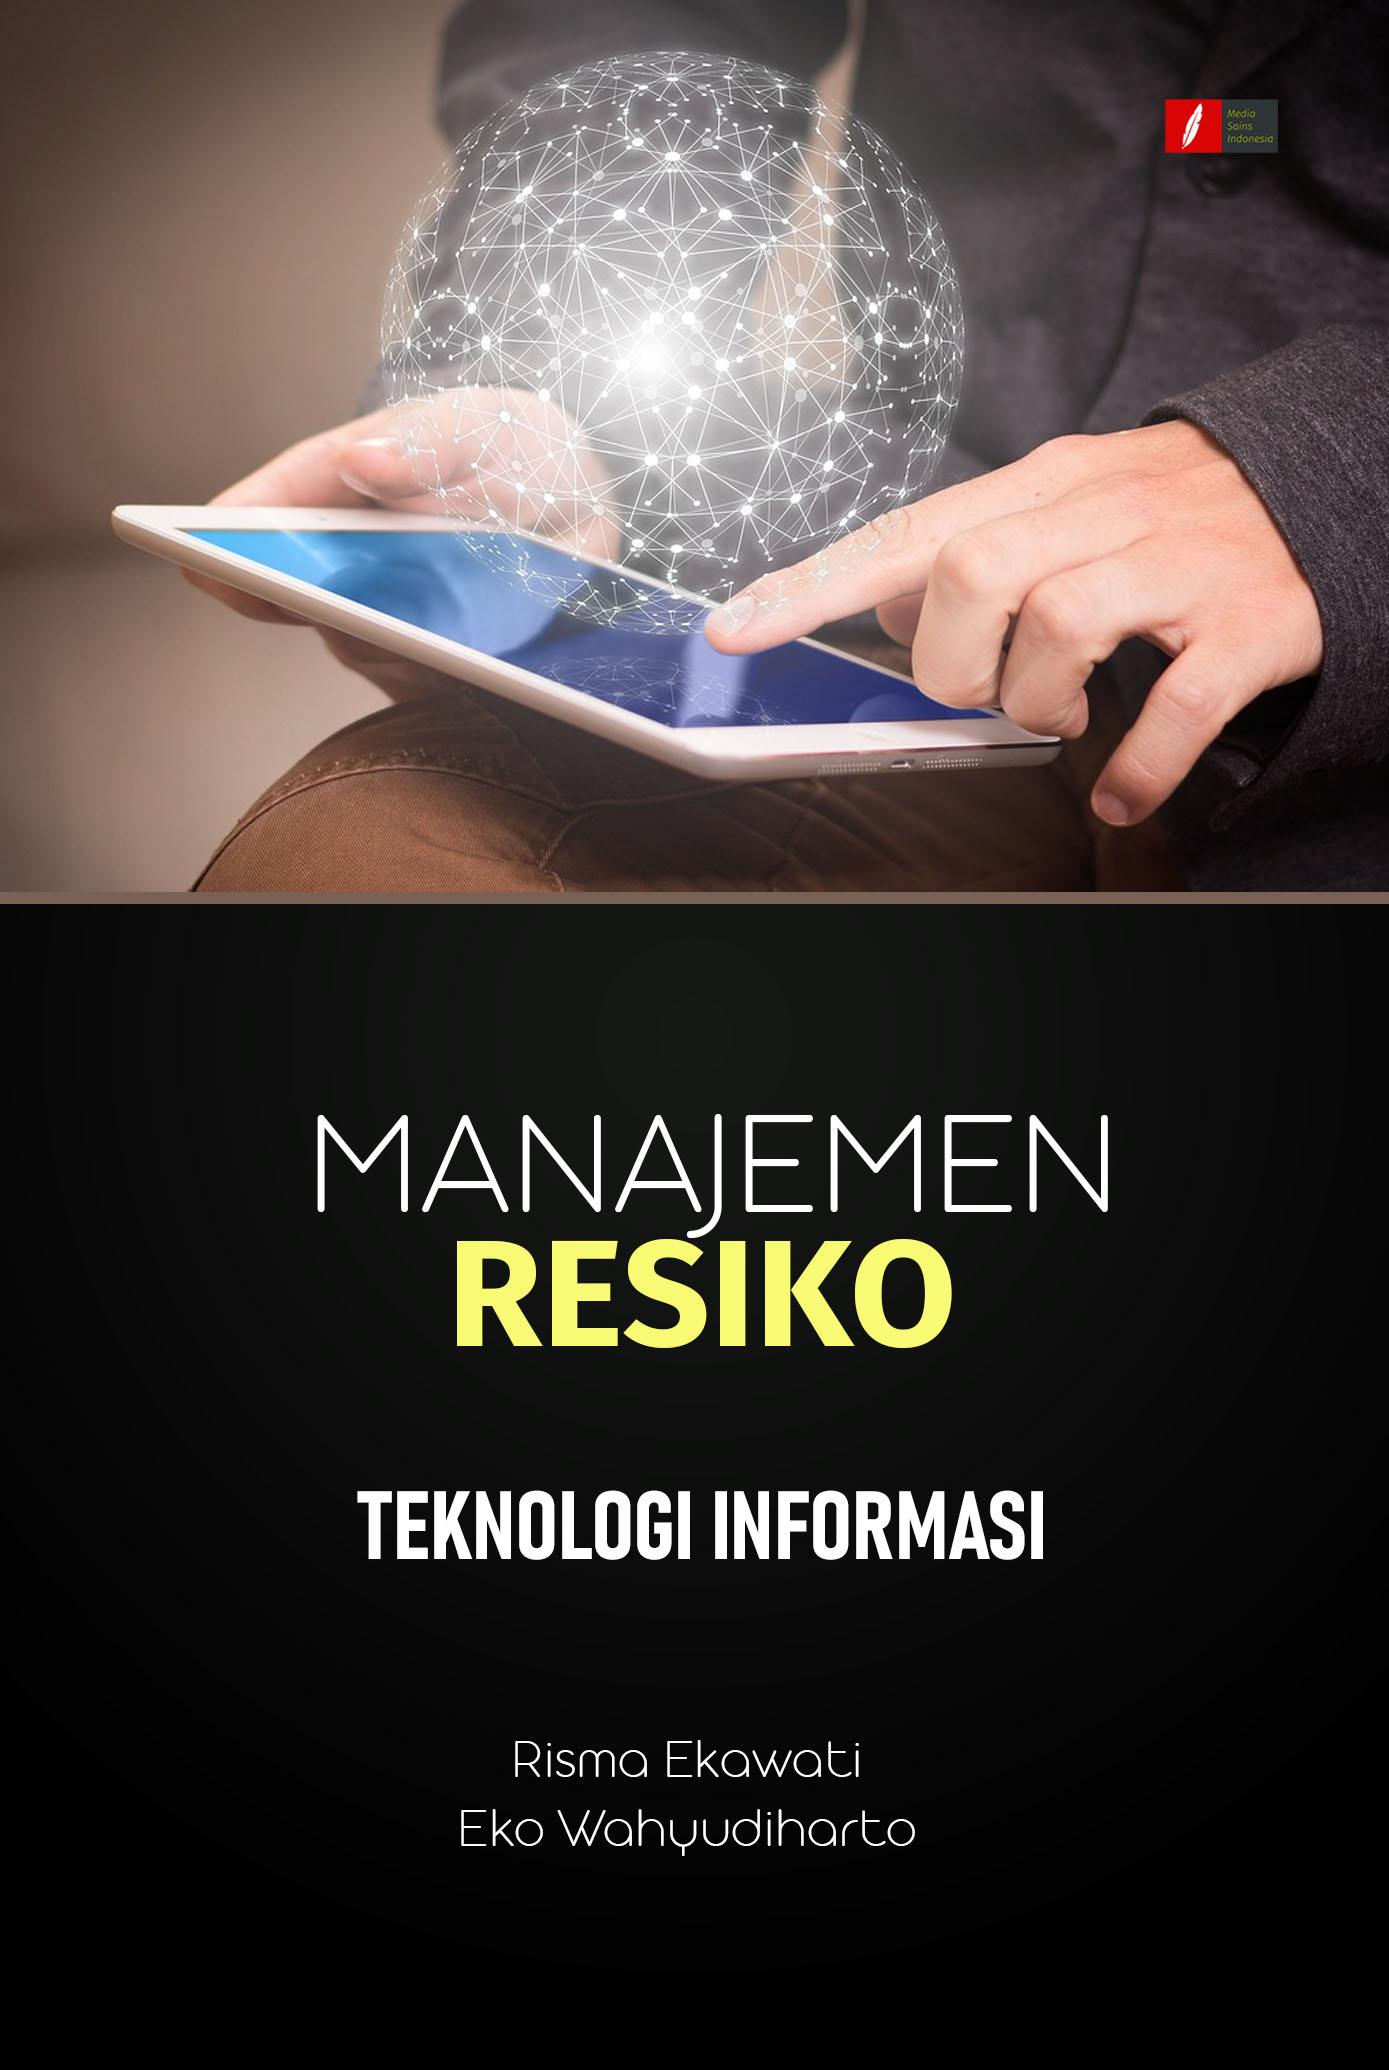 Manajemen resiko teknologi informasi [sumber elektronis]